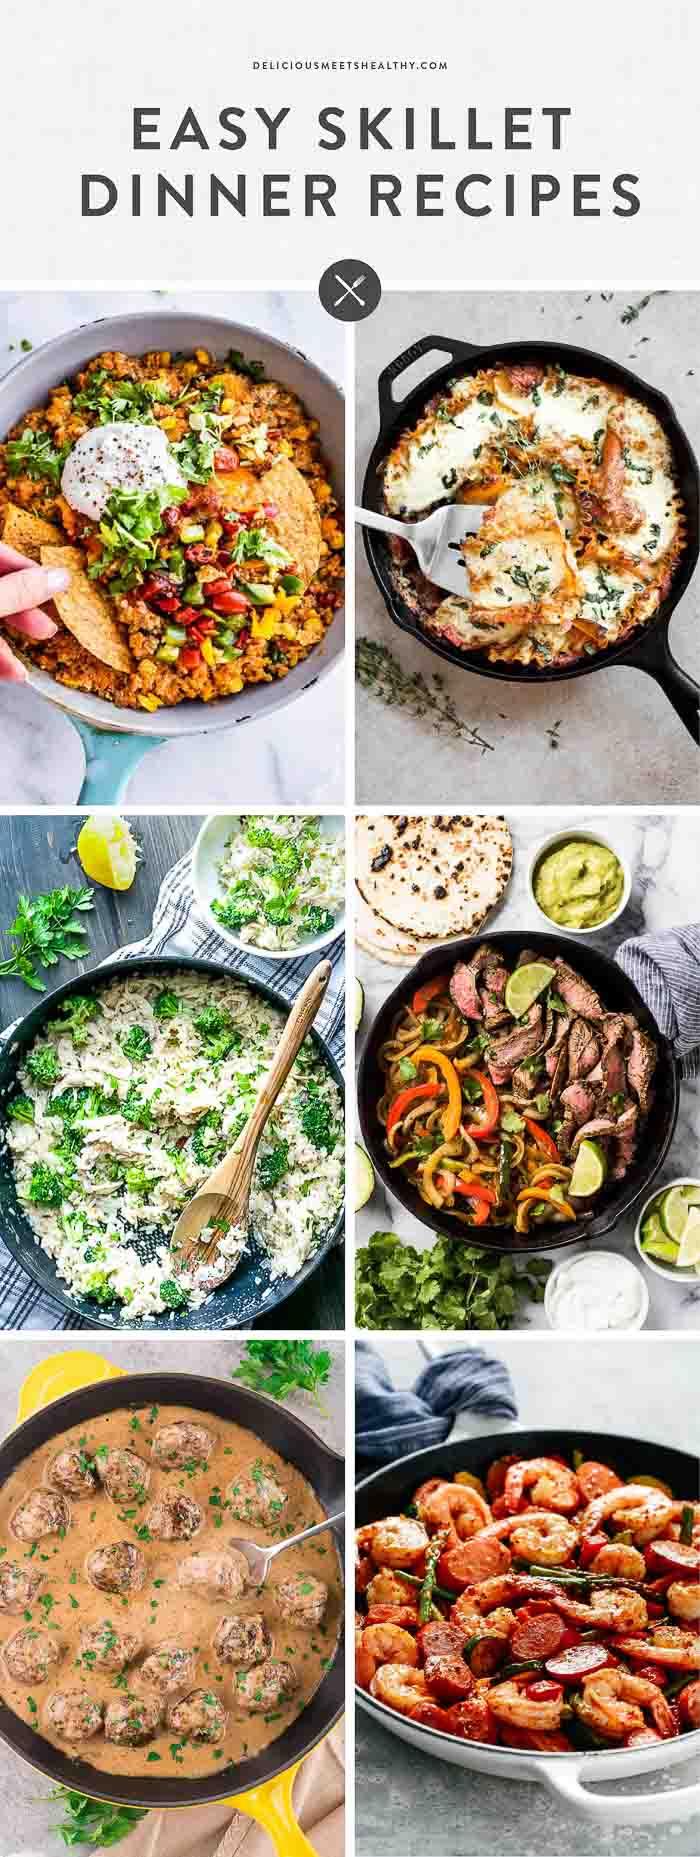 Skillet Recipes roundup